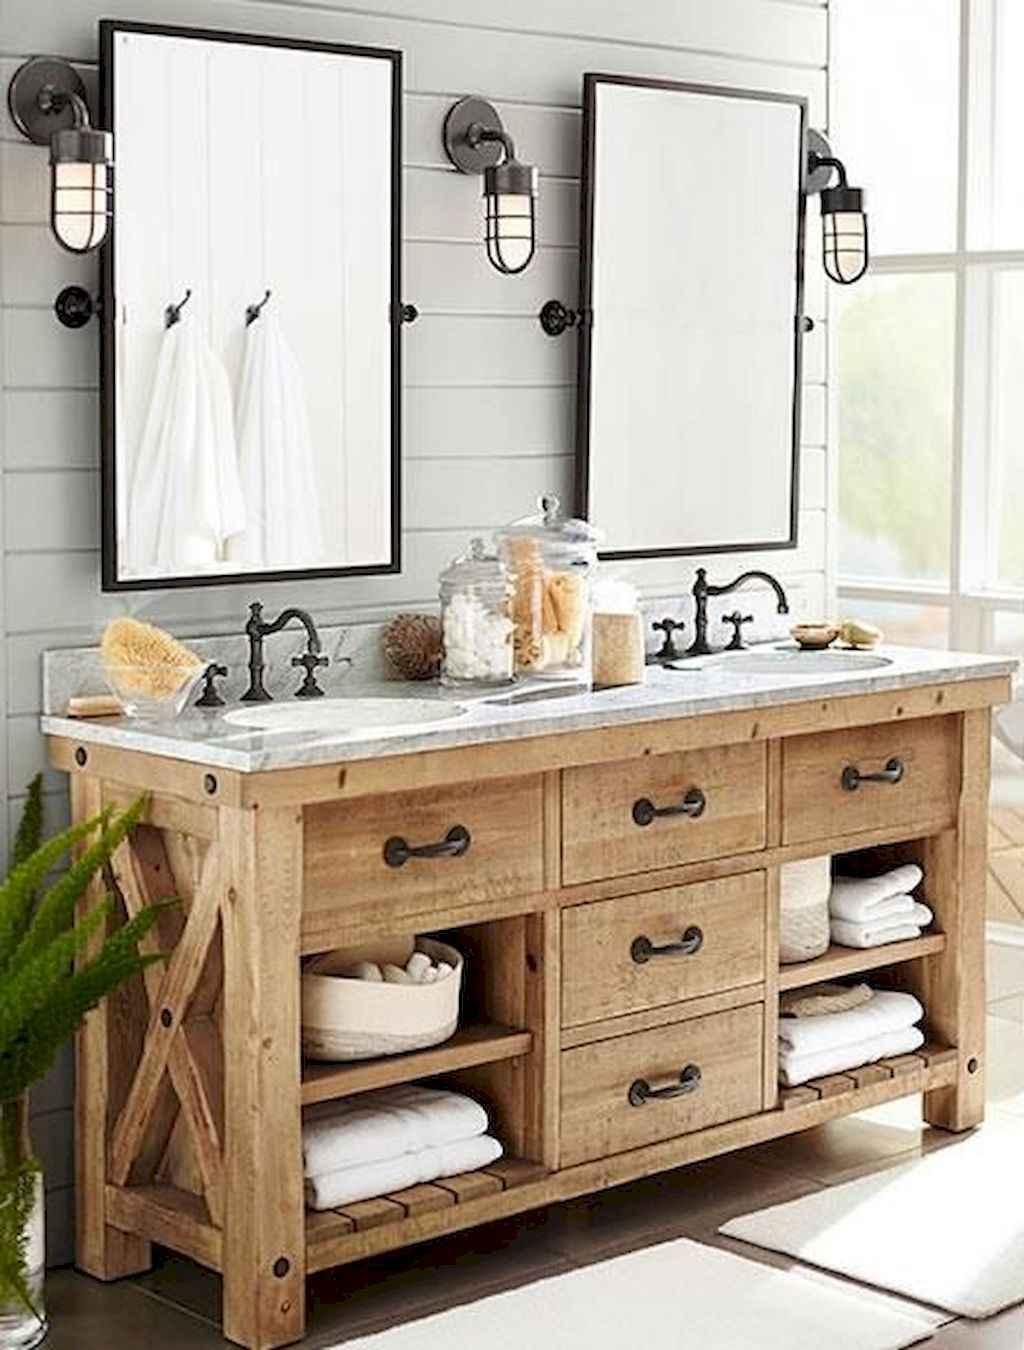 111 Brilliant Small Bathroom Remodel Ideas On A Budget (36)